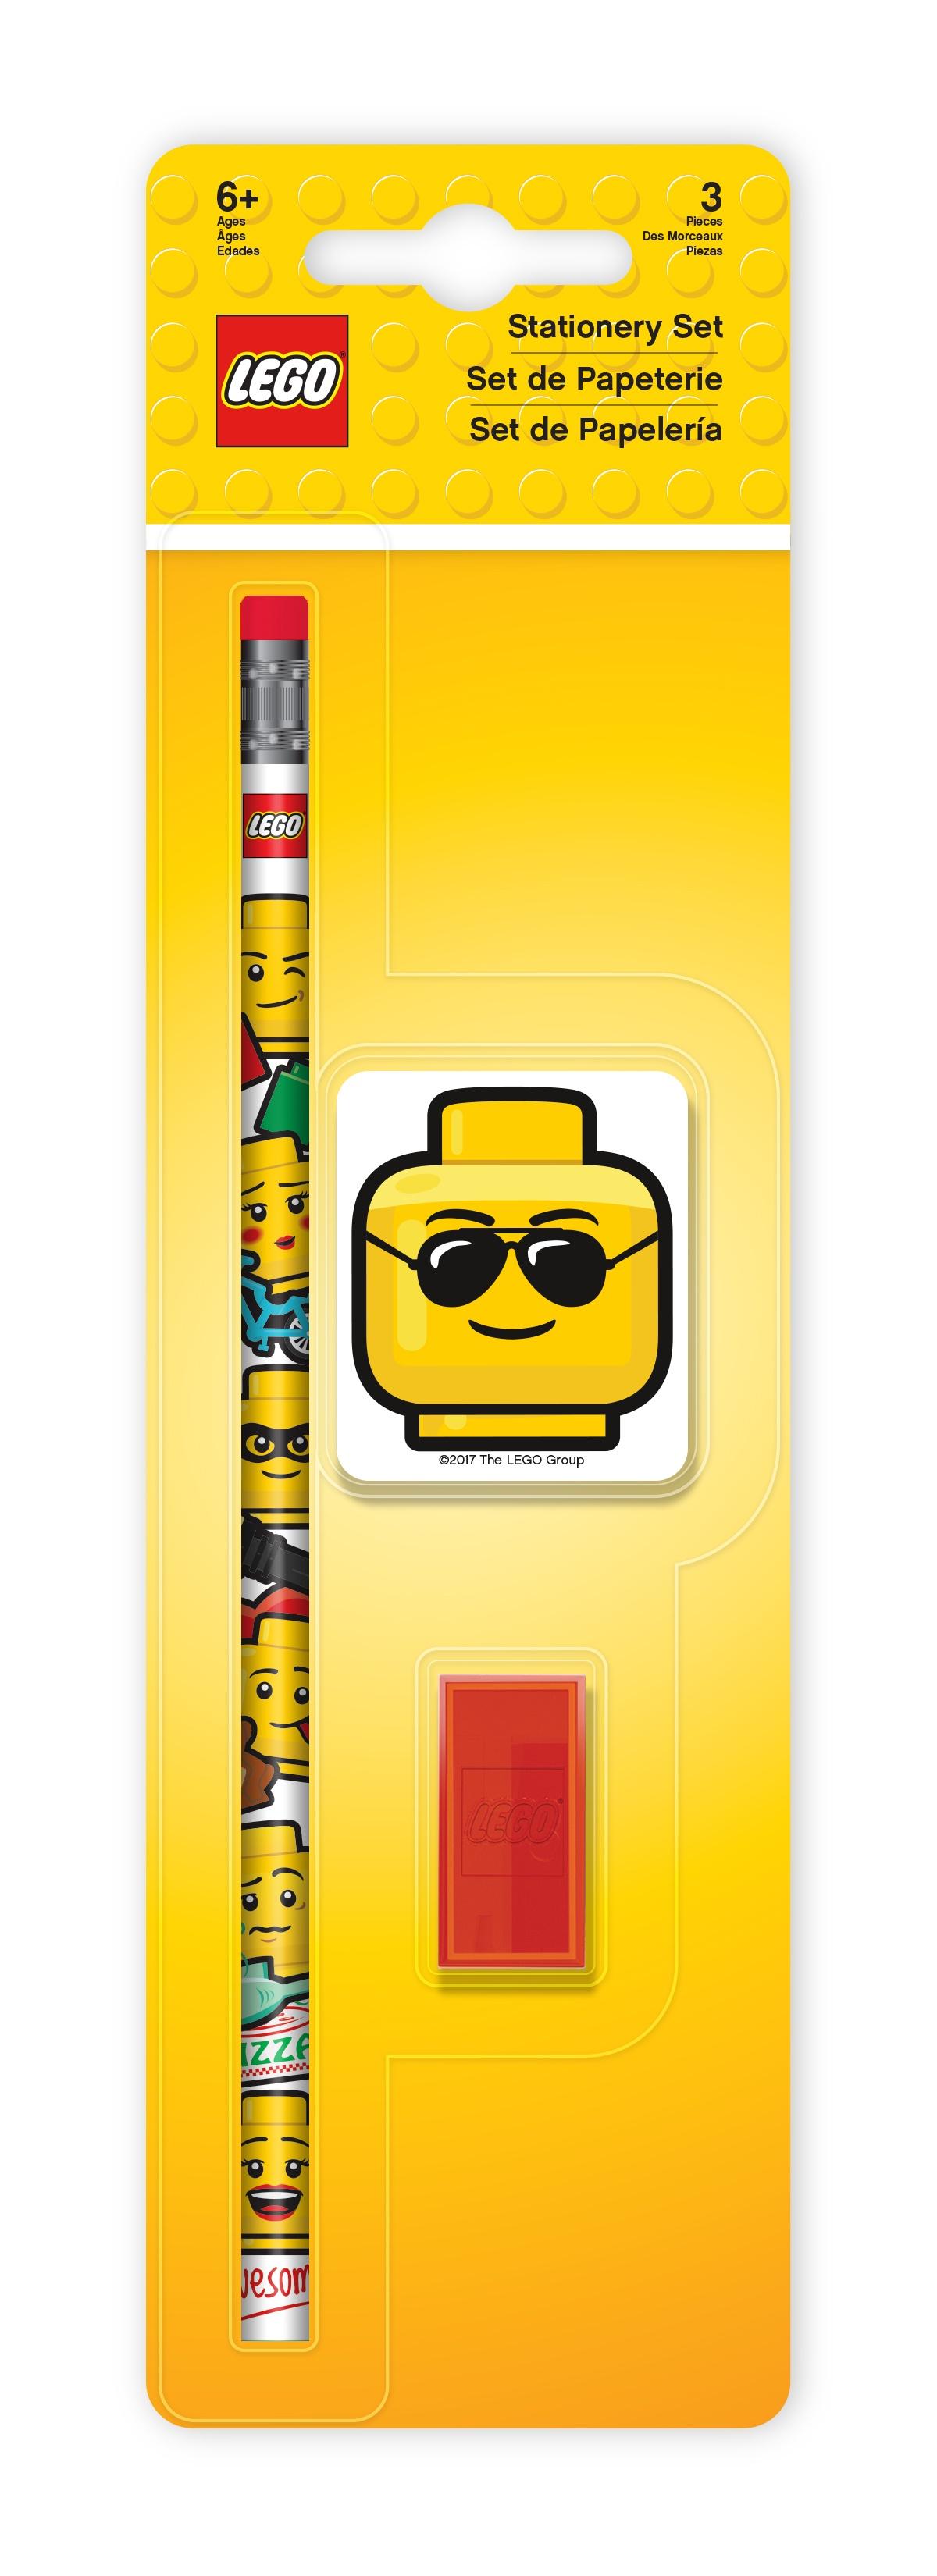 Набор канцелярский: 1 карандаш, 1 точилка, 1 ластик LEGO академия групп набор канцелярский точилка ластик тачки